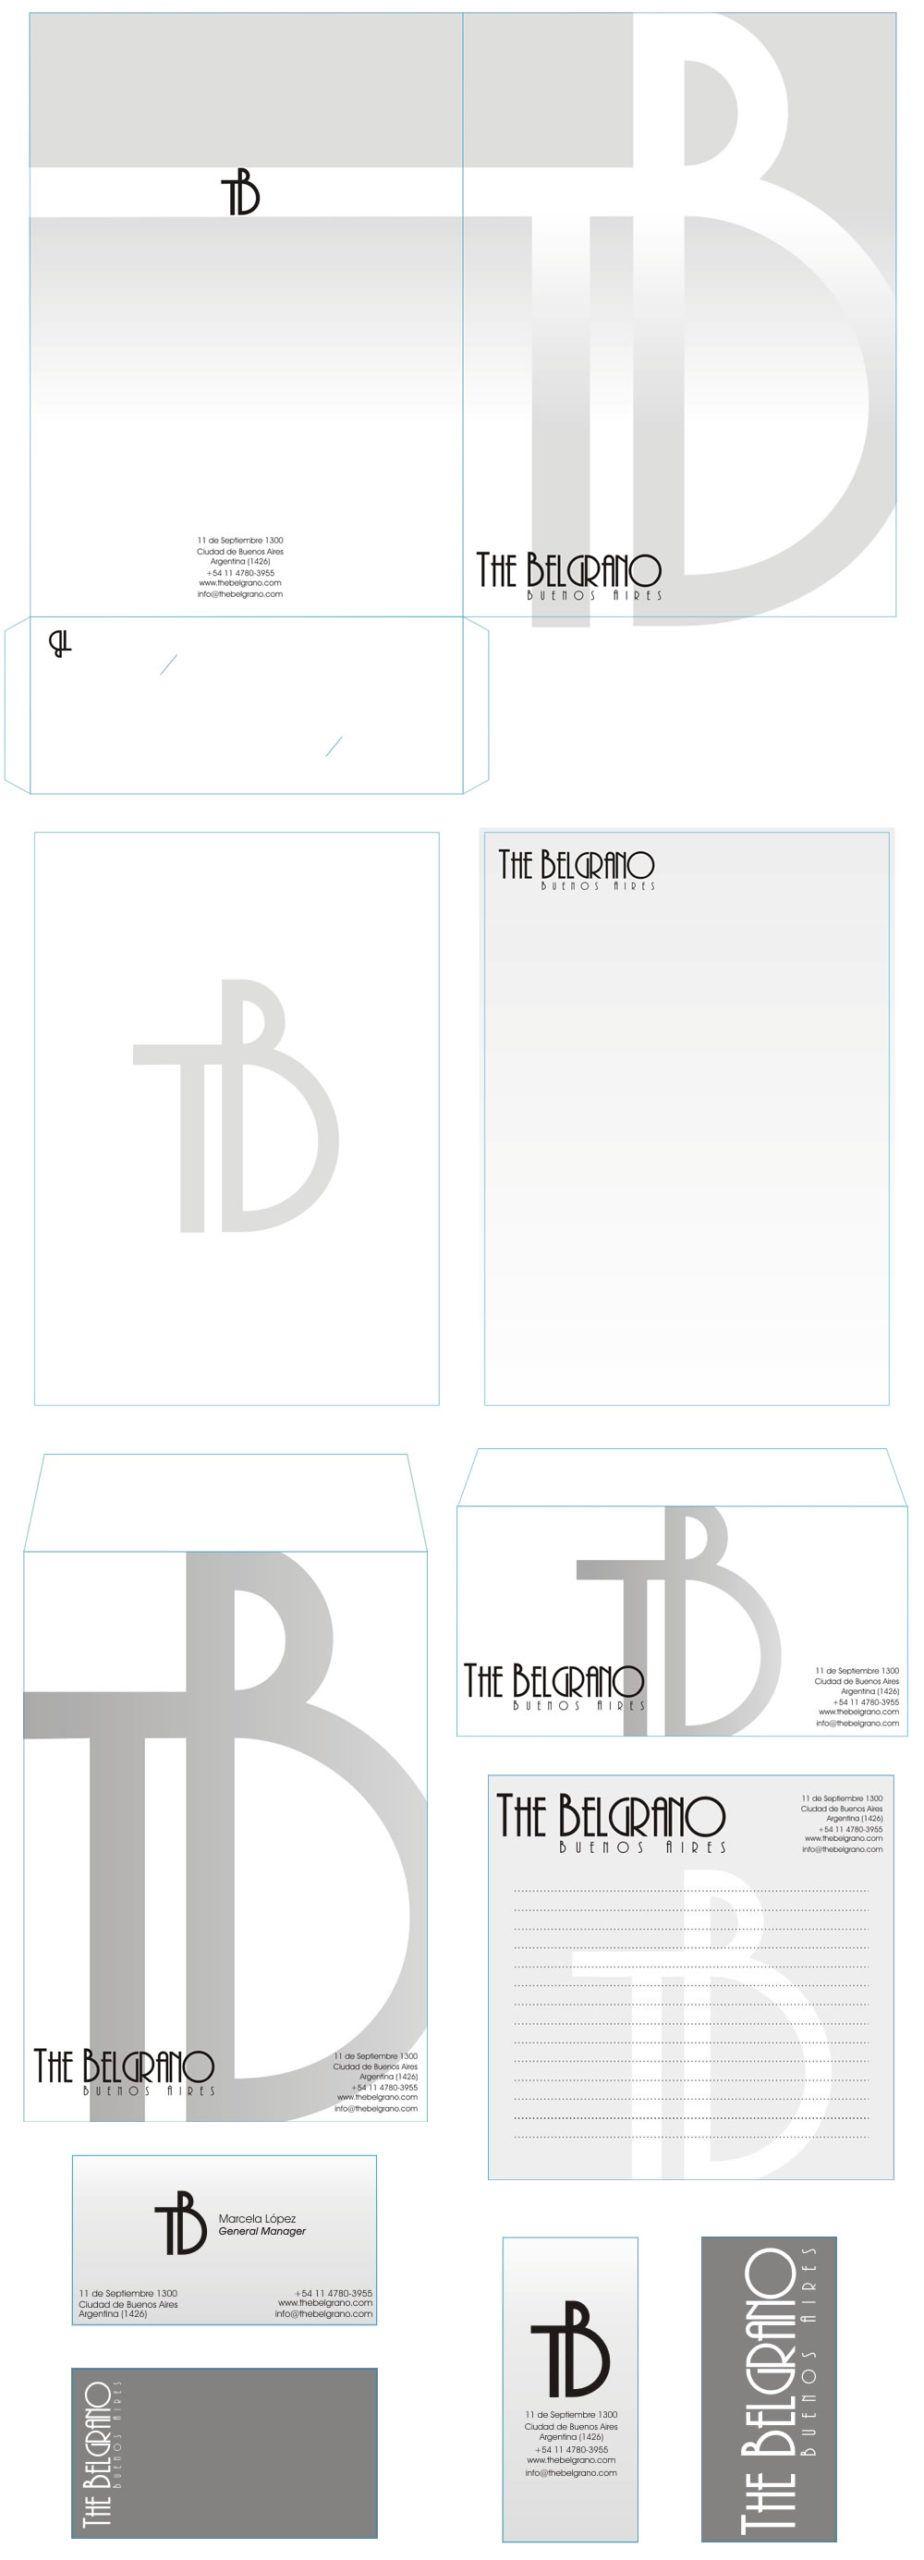 Stationary Design The Belgrano